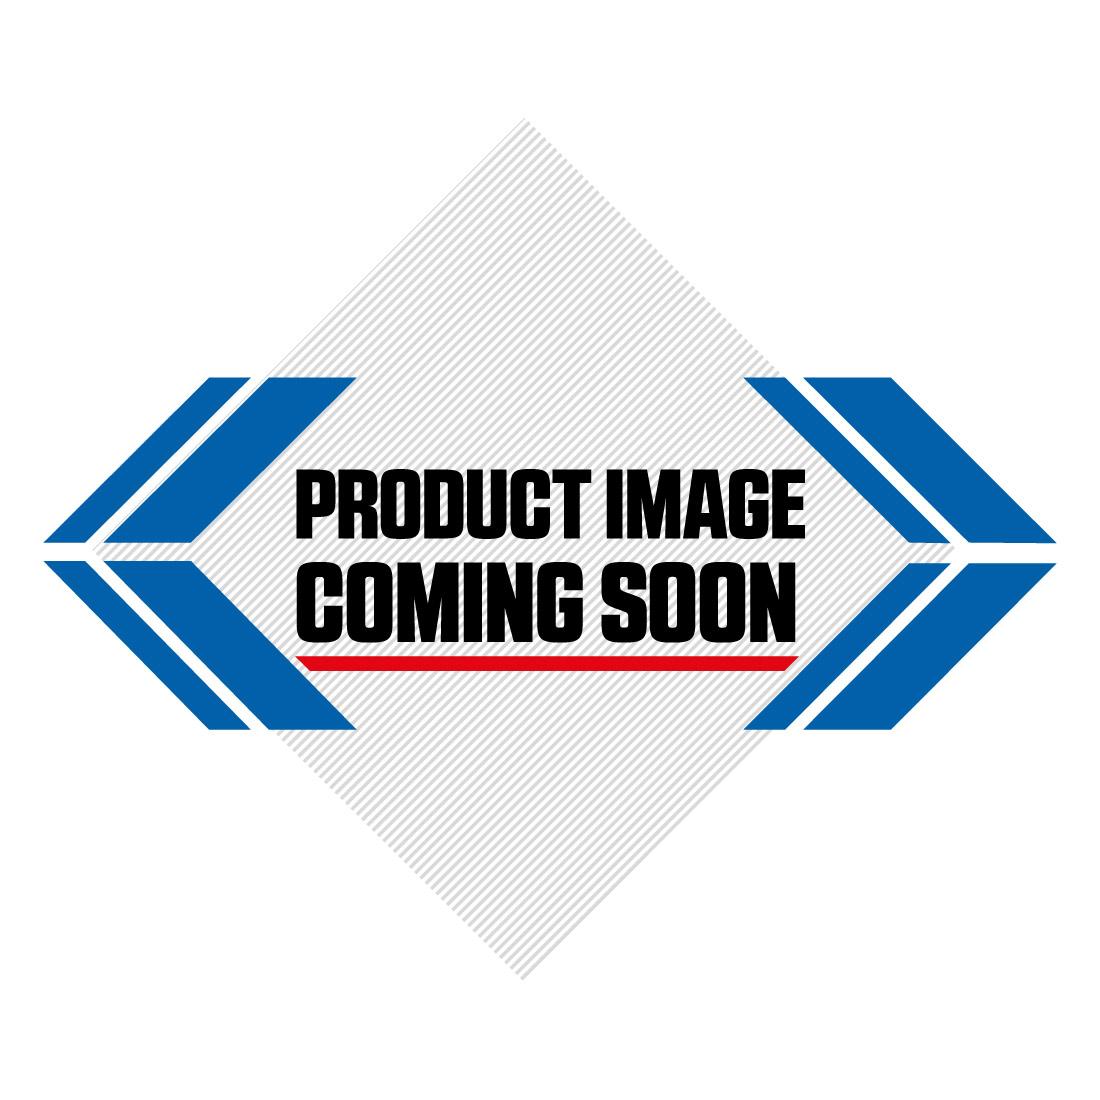 Honda Plastic Kit CR 125 (87-88) OEM Factory (1988) Image-5>